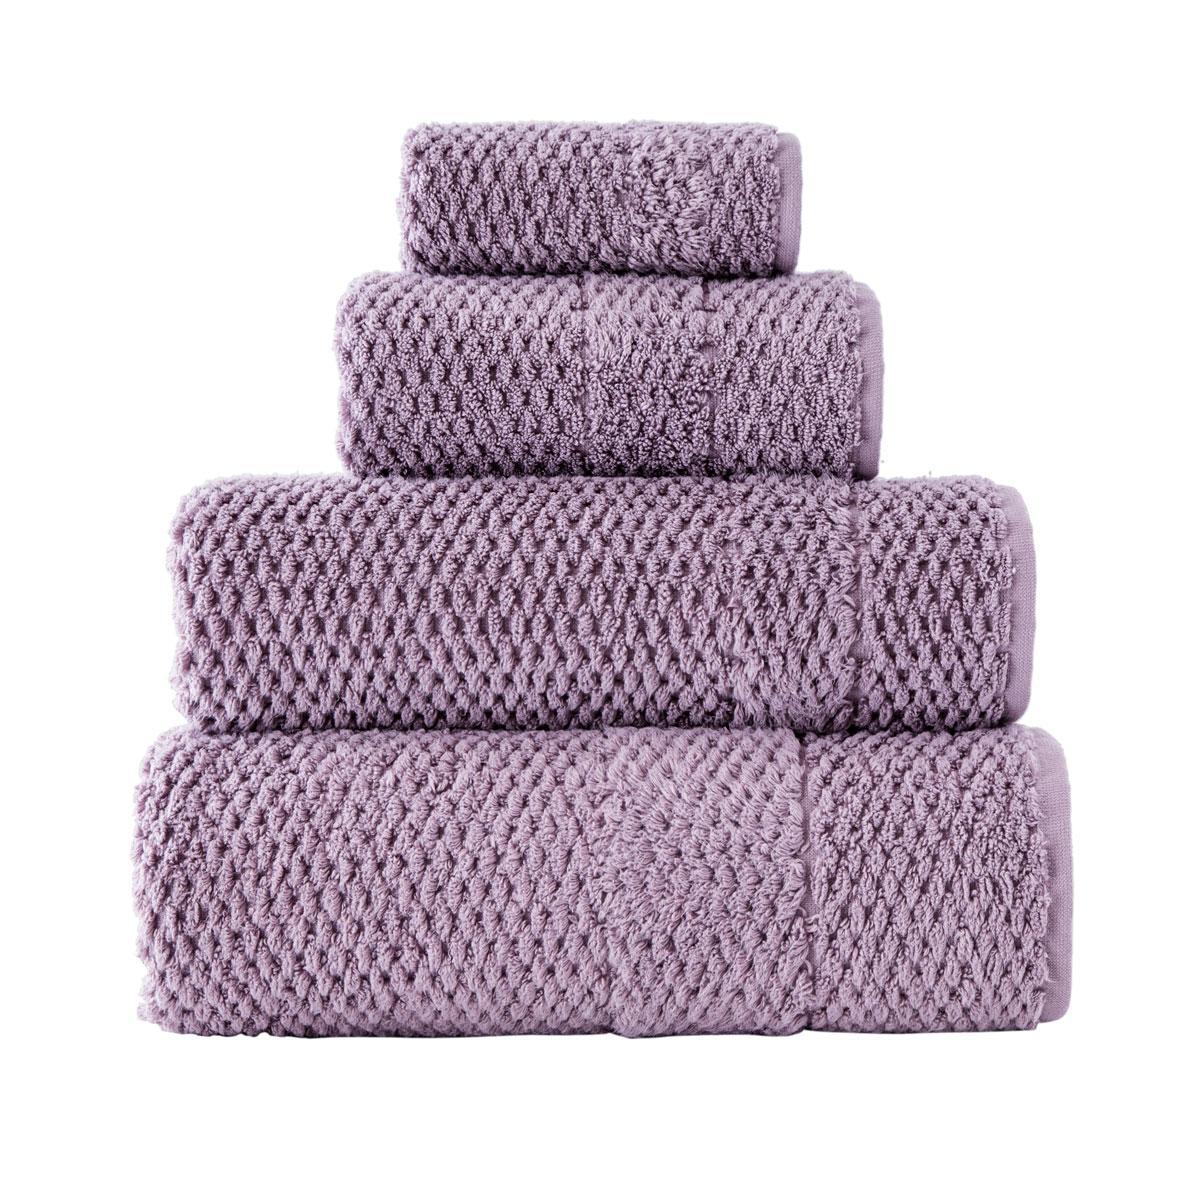 Полотенце для тела Arya Arno 70*140 см махровое банное пурпурное арт.TR1001809